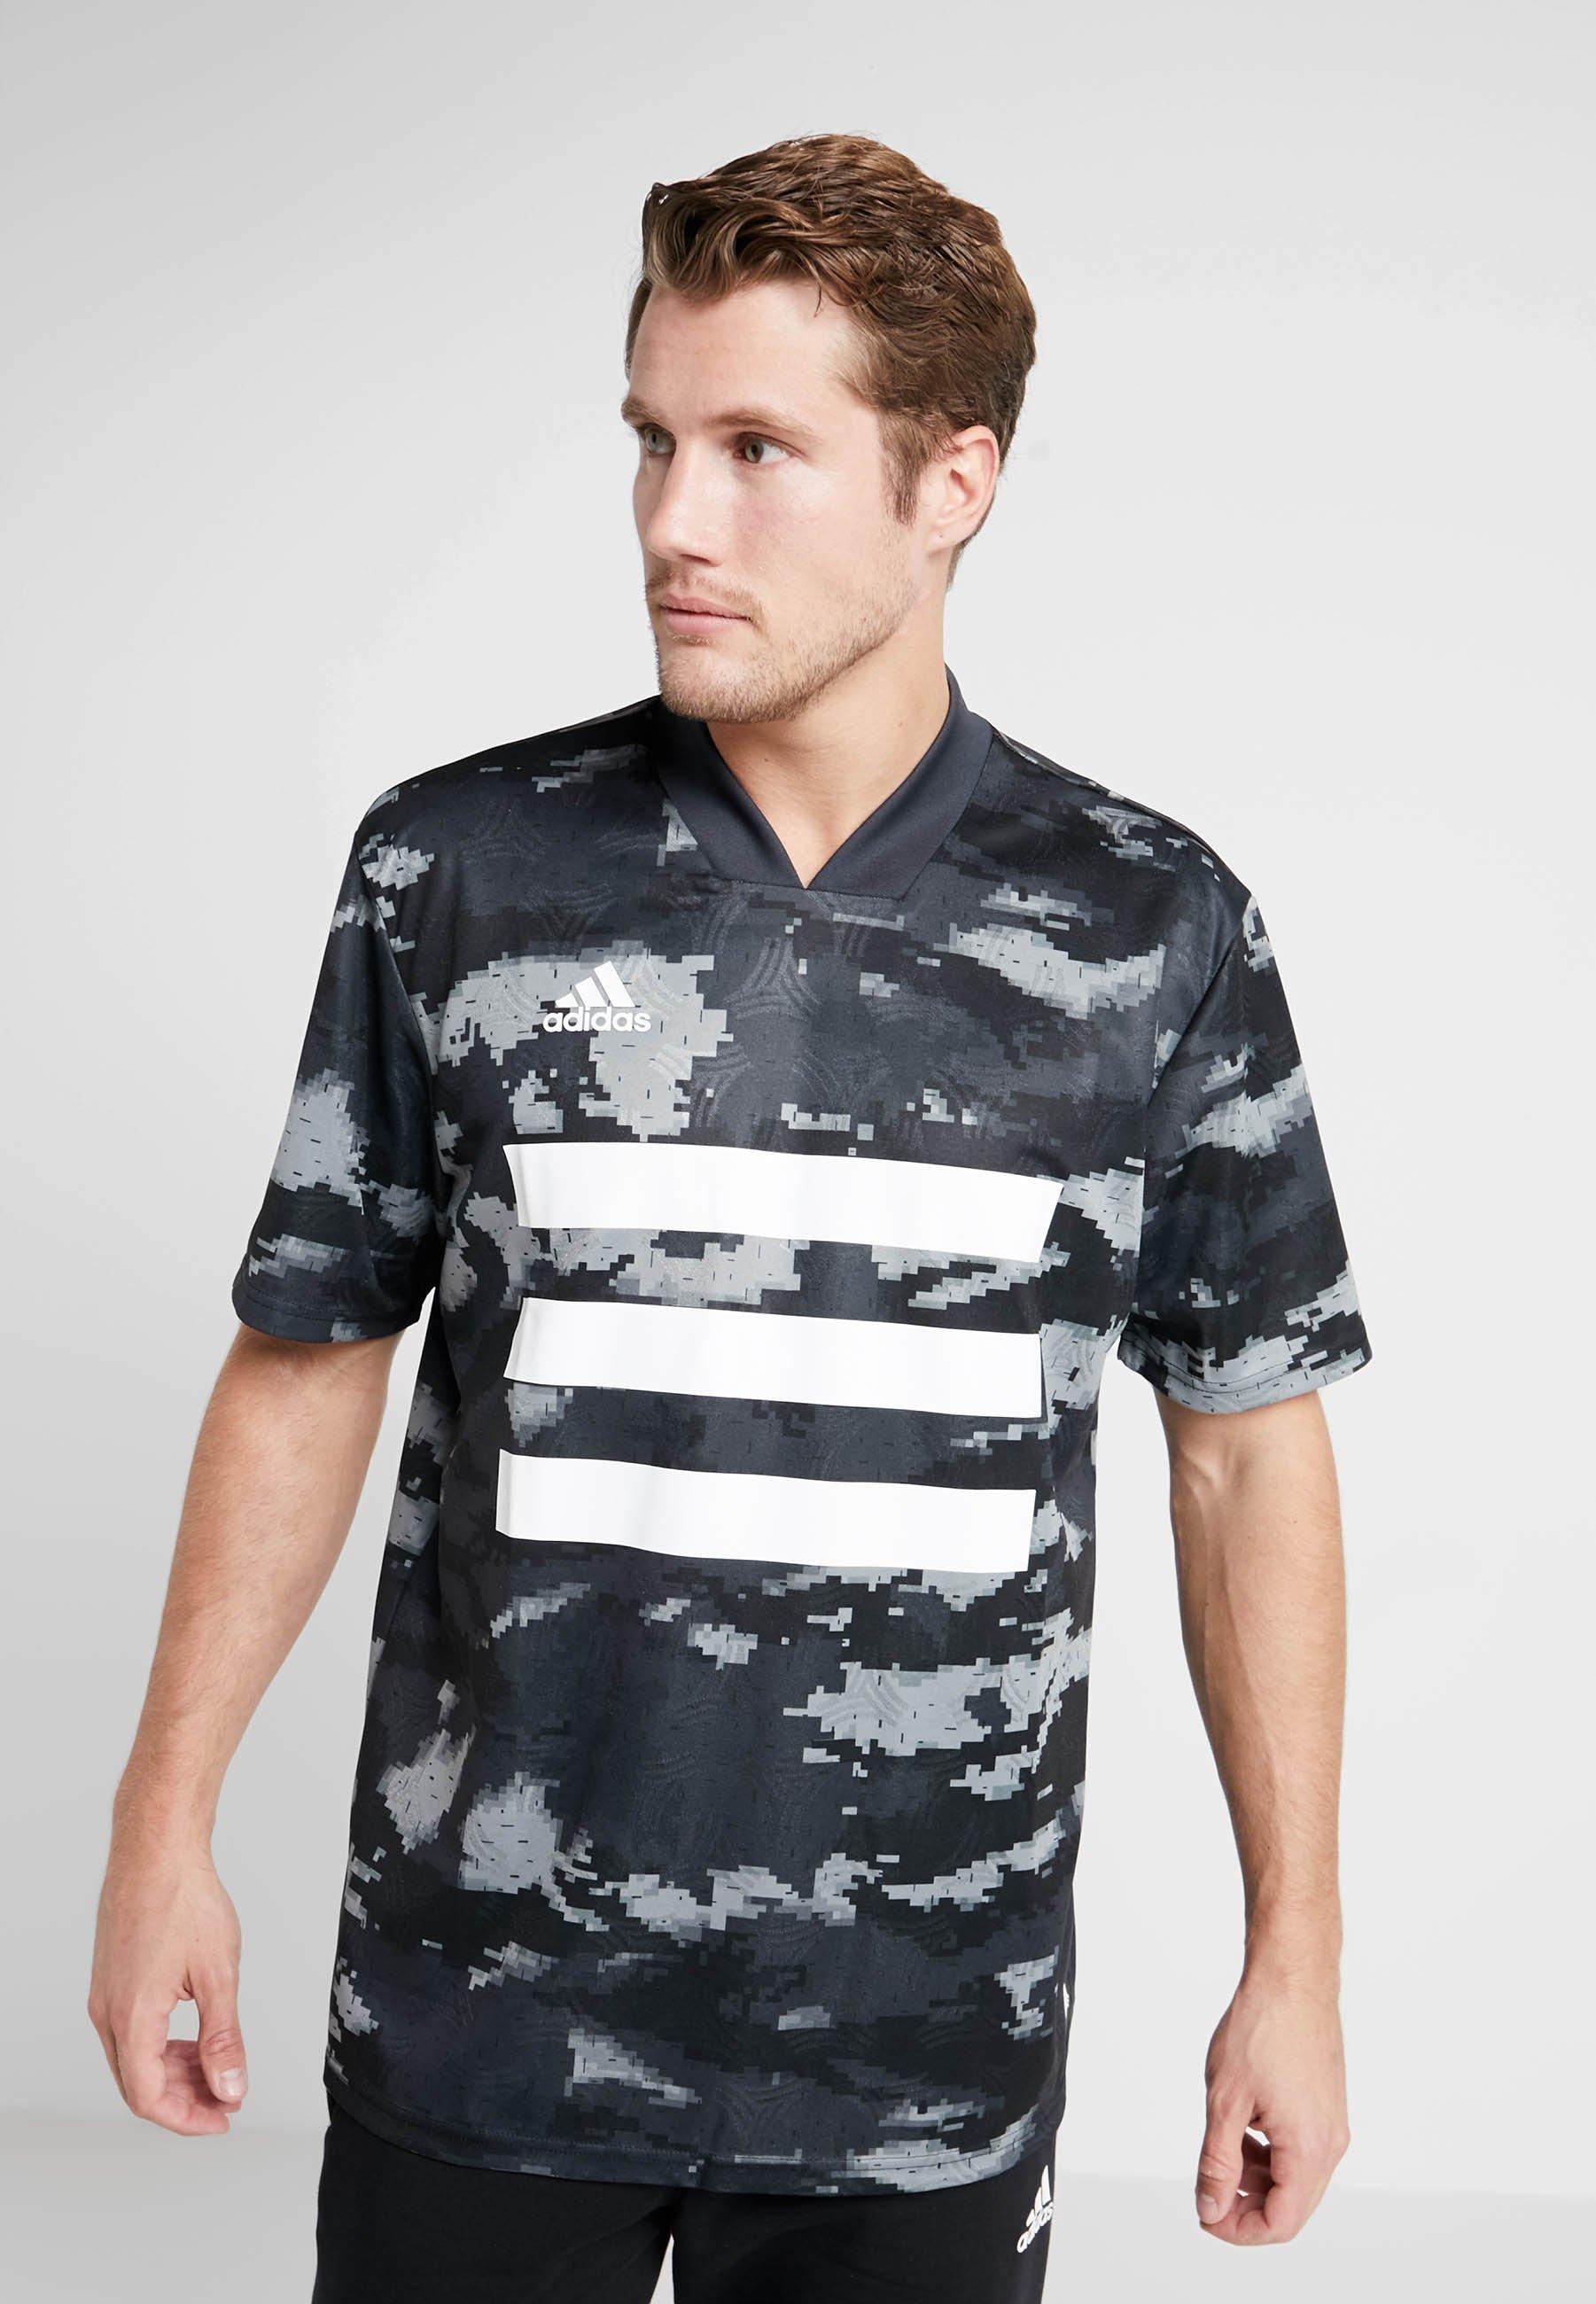 Imprimé Adidas Black shirt TanT Performance kZuPOXi